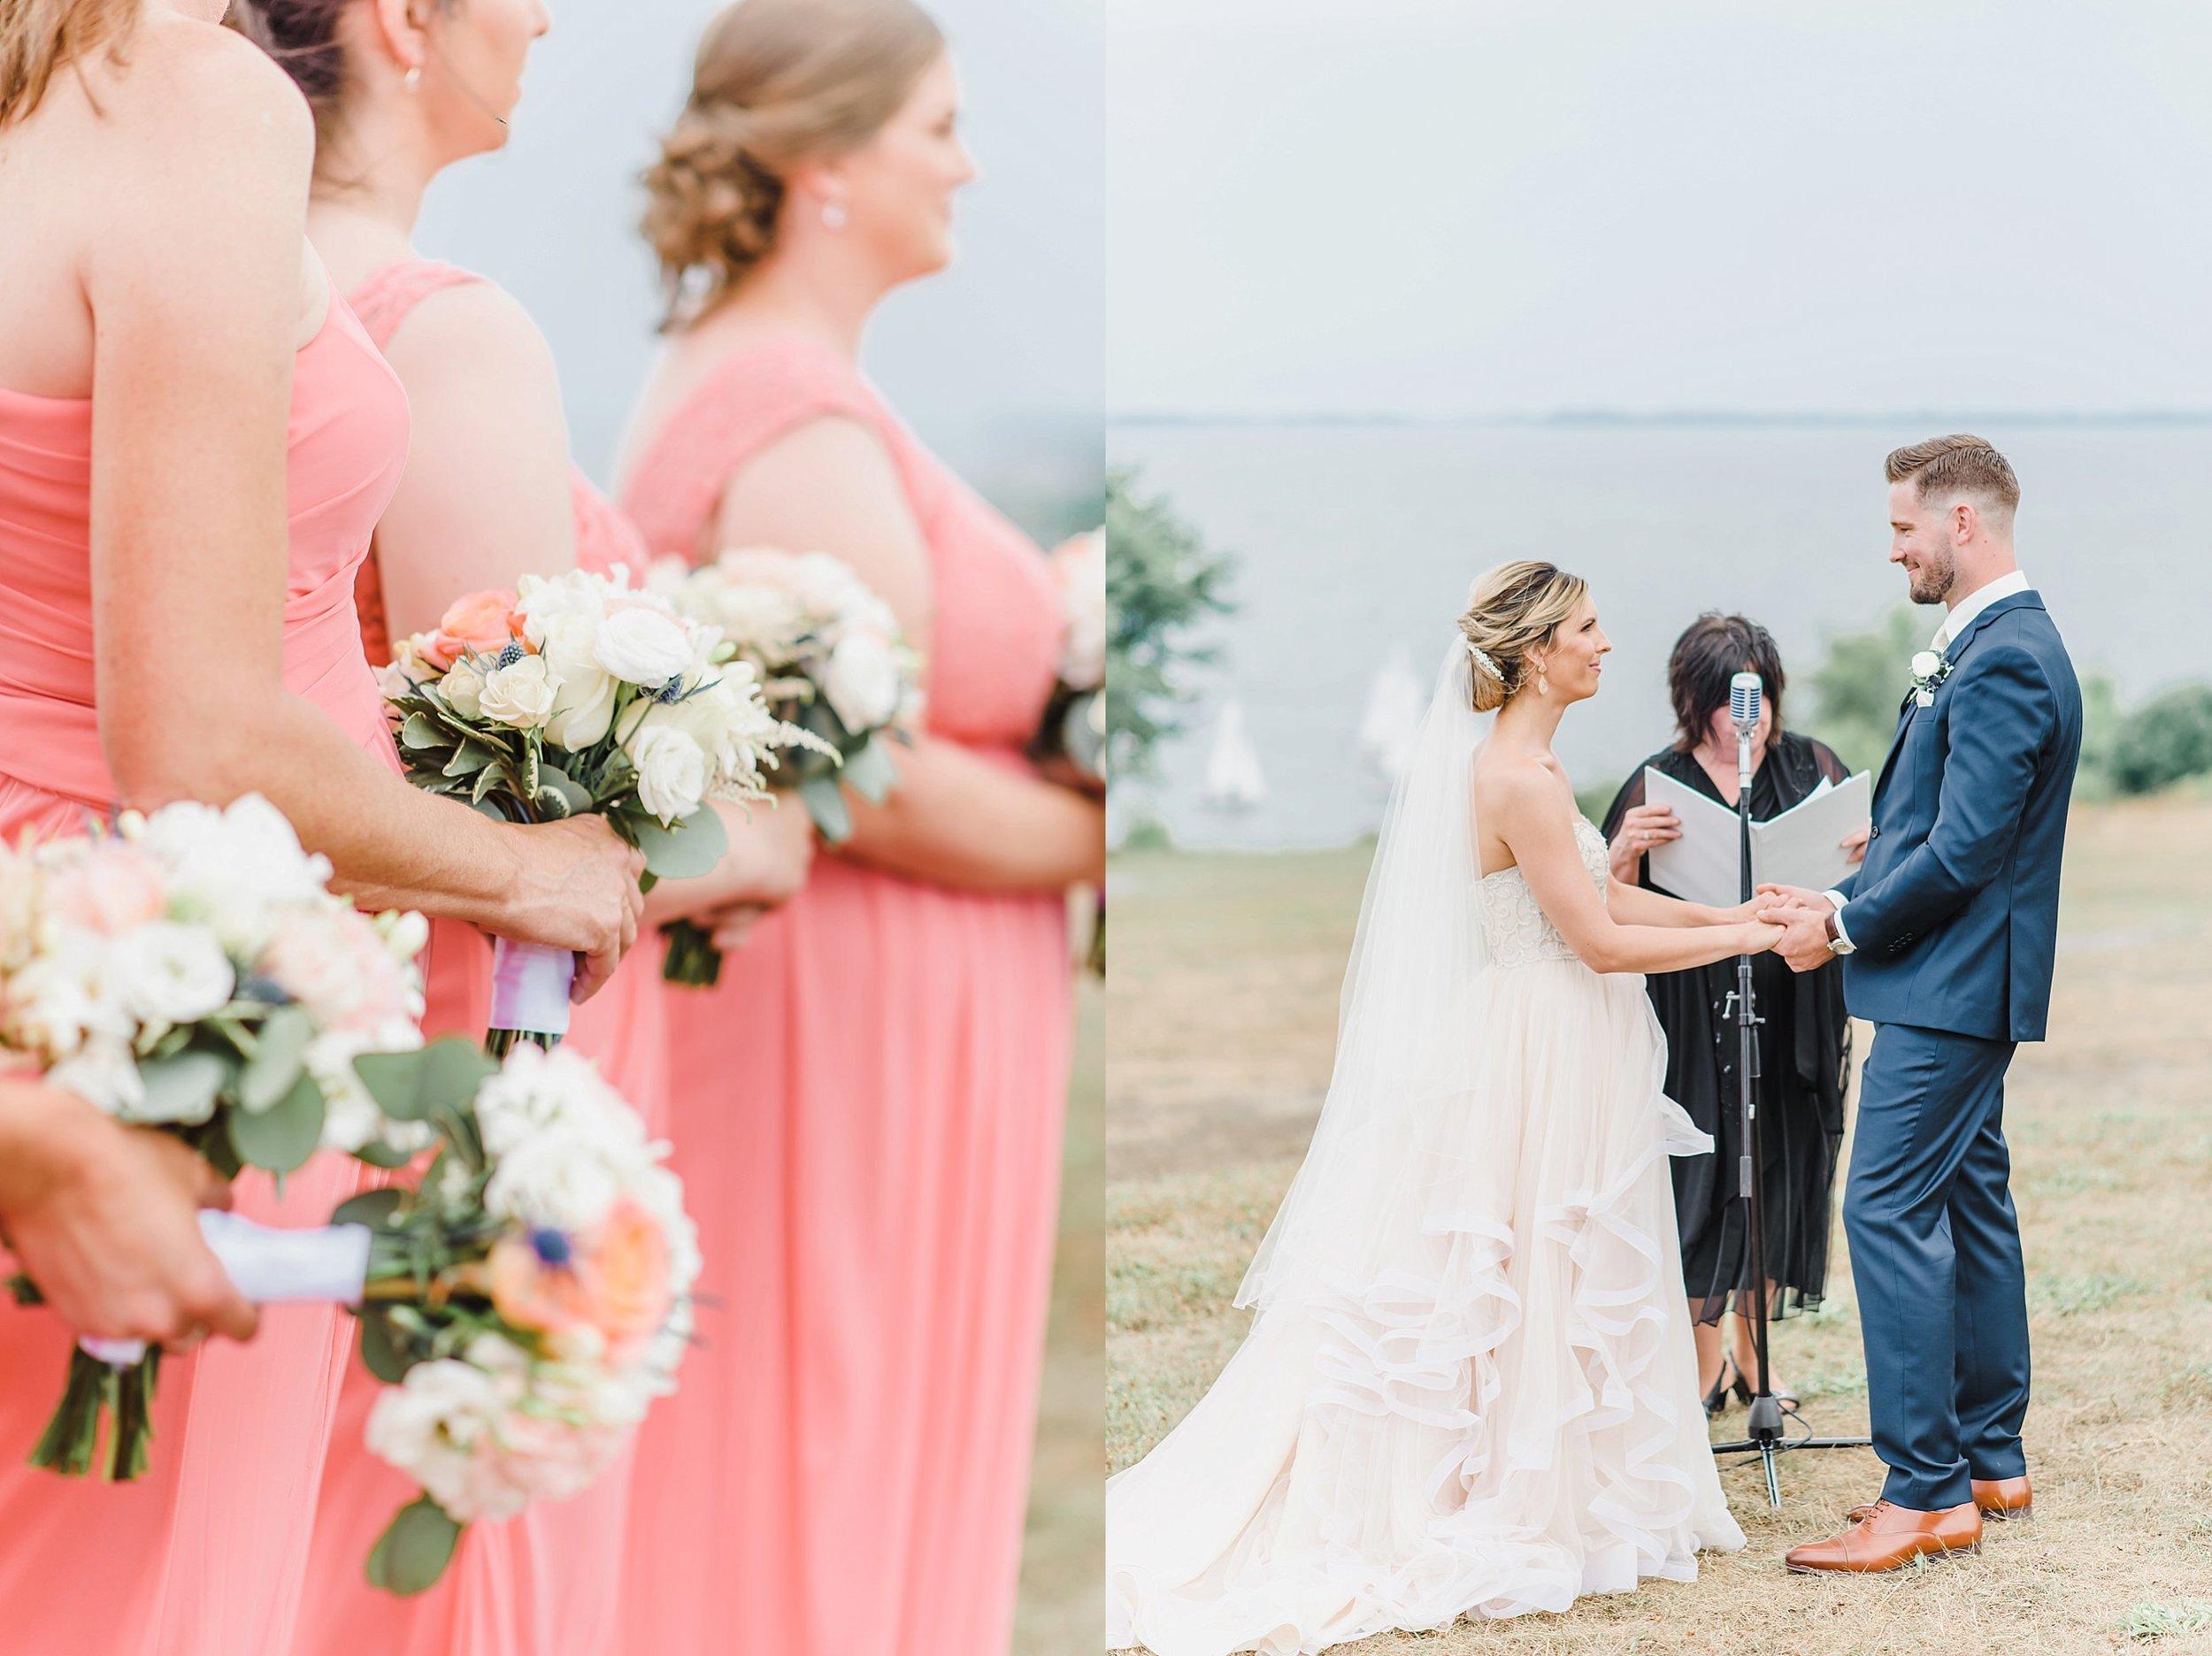 light airy indie fine art ottawa wedding photographer | Ali and Batoul Photography_0185.jpg